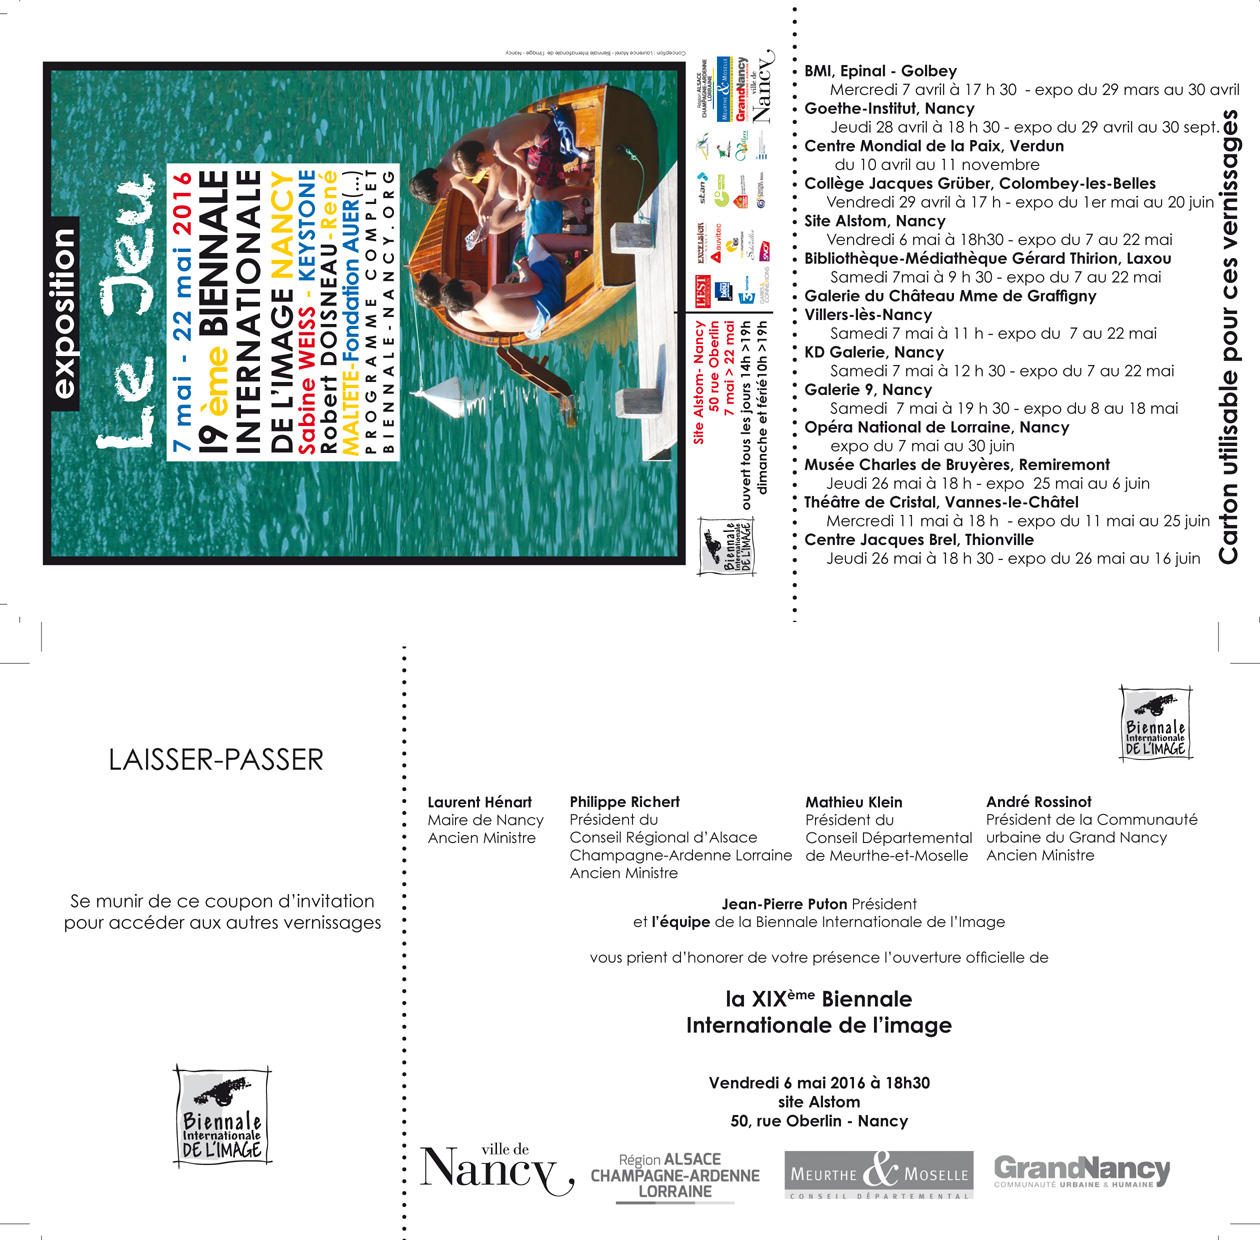 biennale-carton-invitation-2016-net